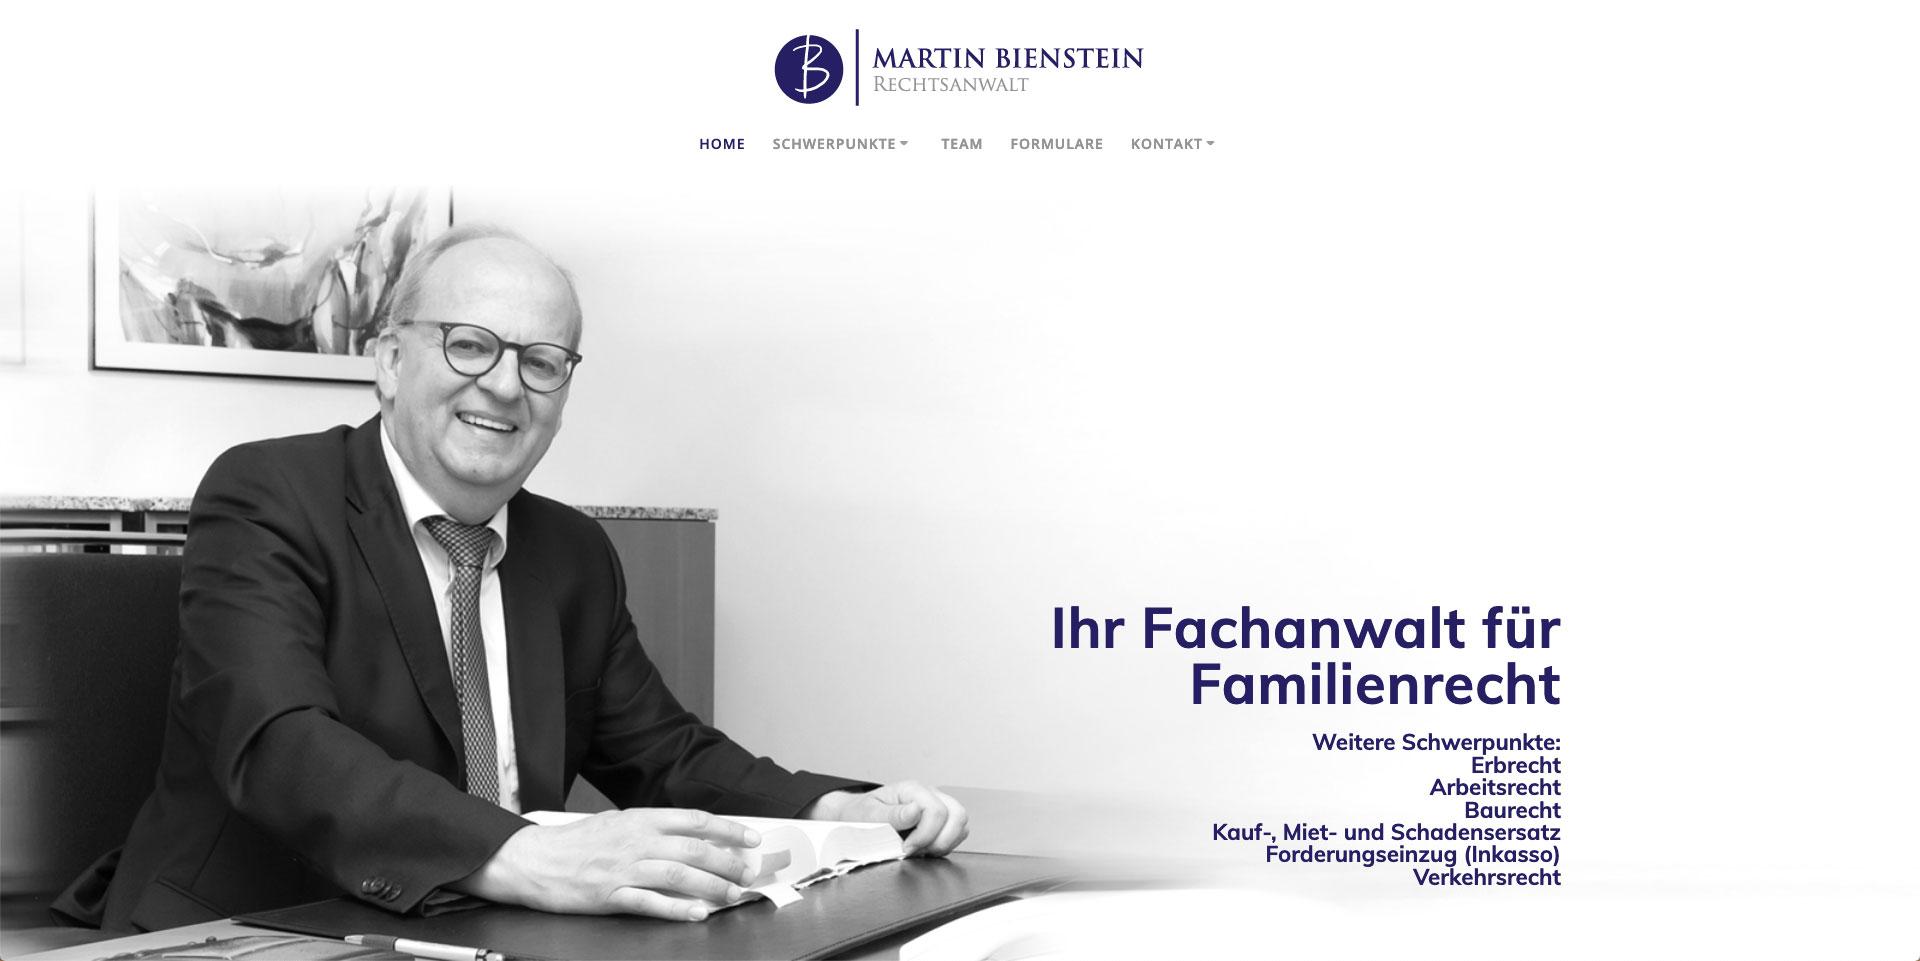 Webgestaltung, Rechtsanwalt Martin Bienstein